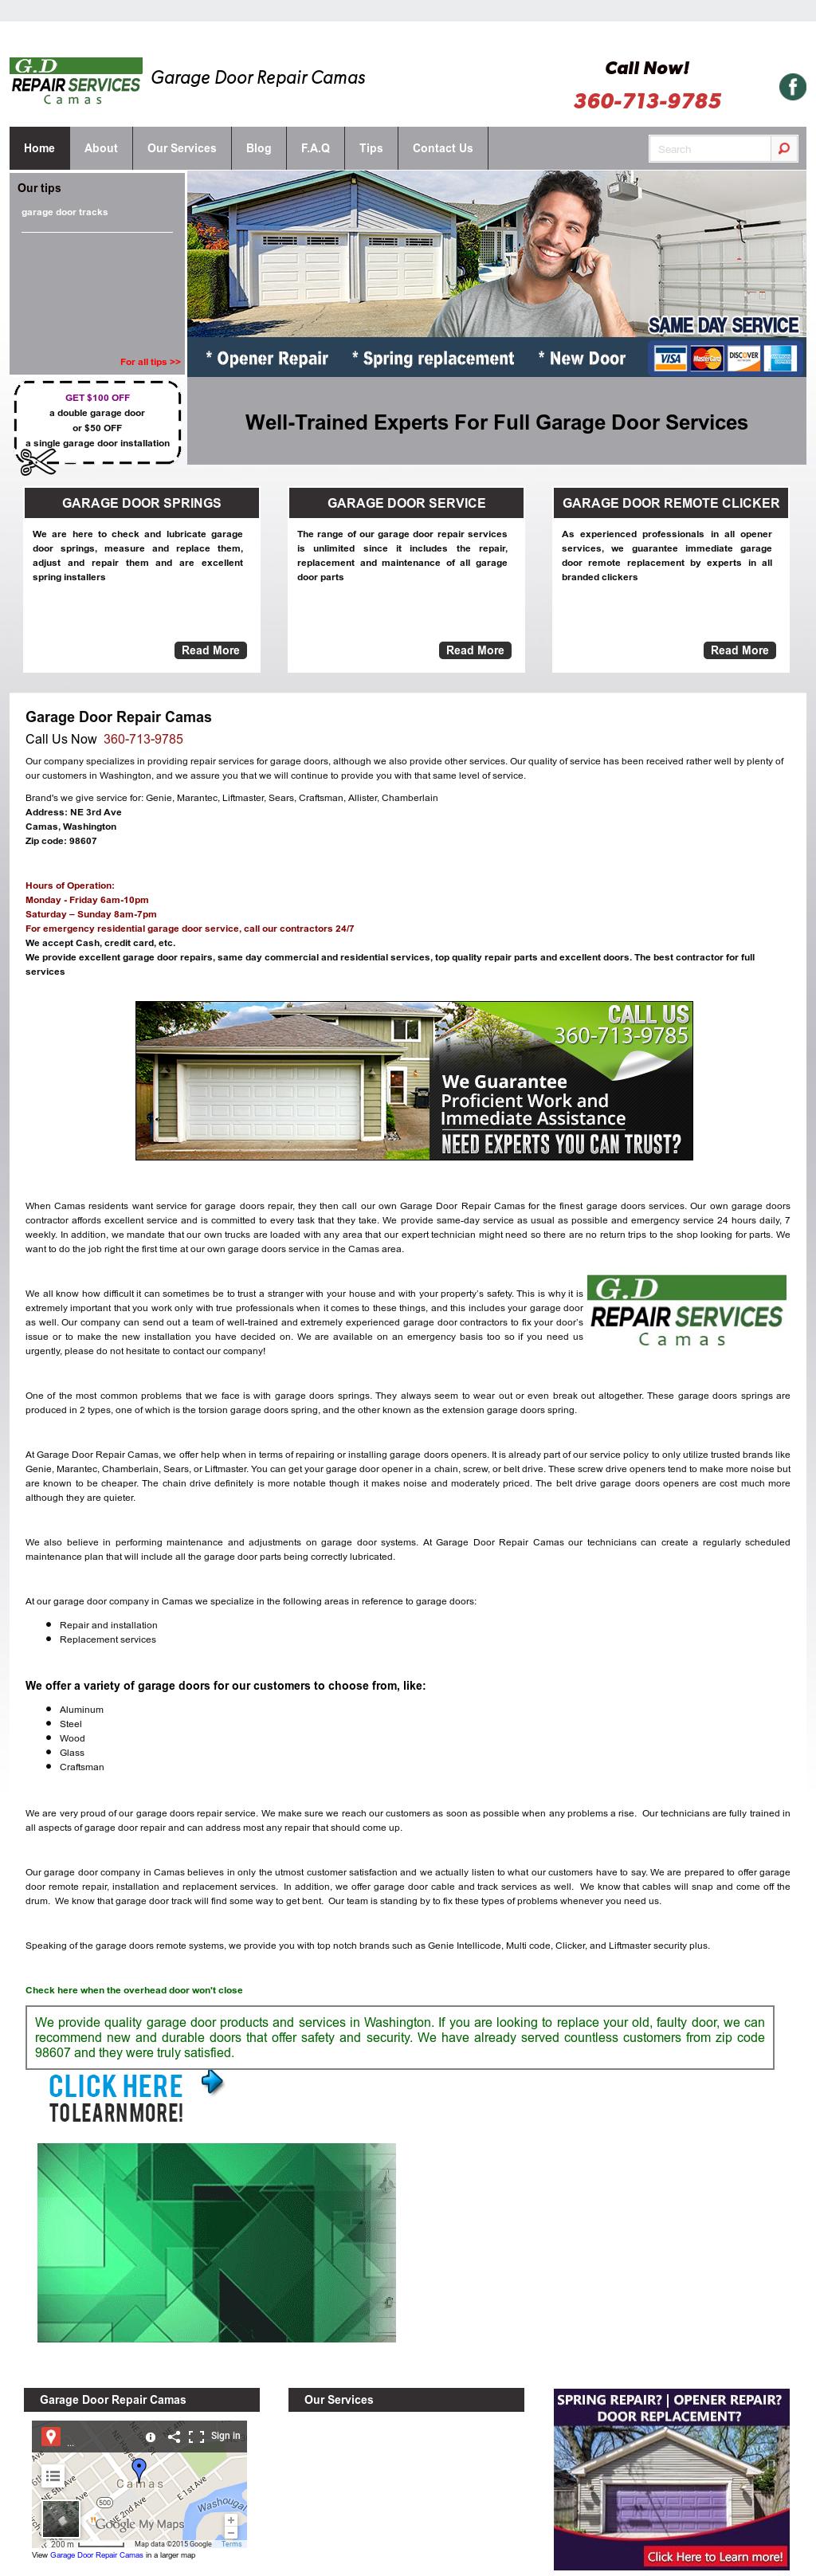 Repair Garage Door Camas Competitors Revenue And Employees Owler